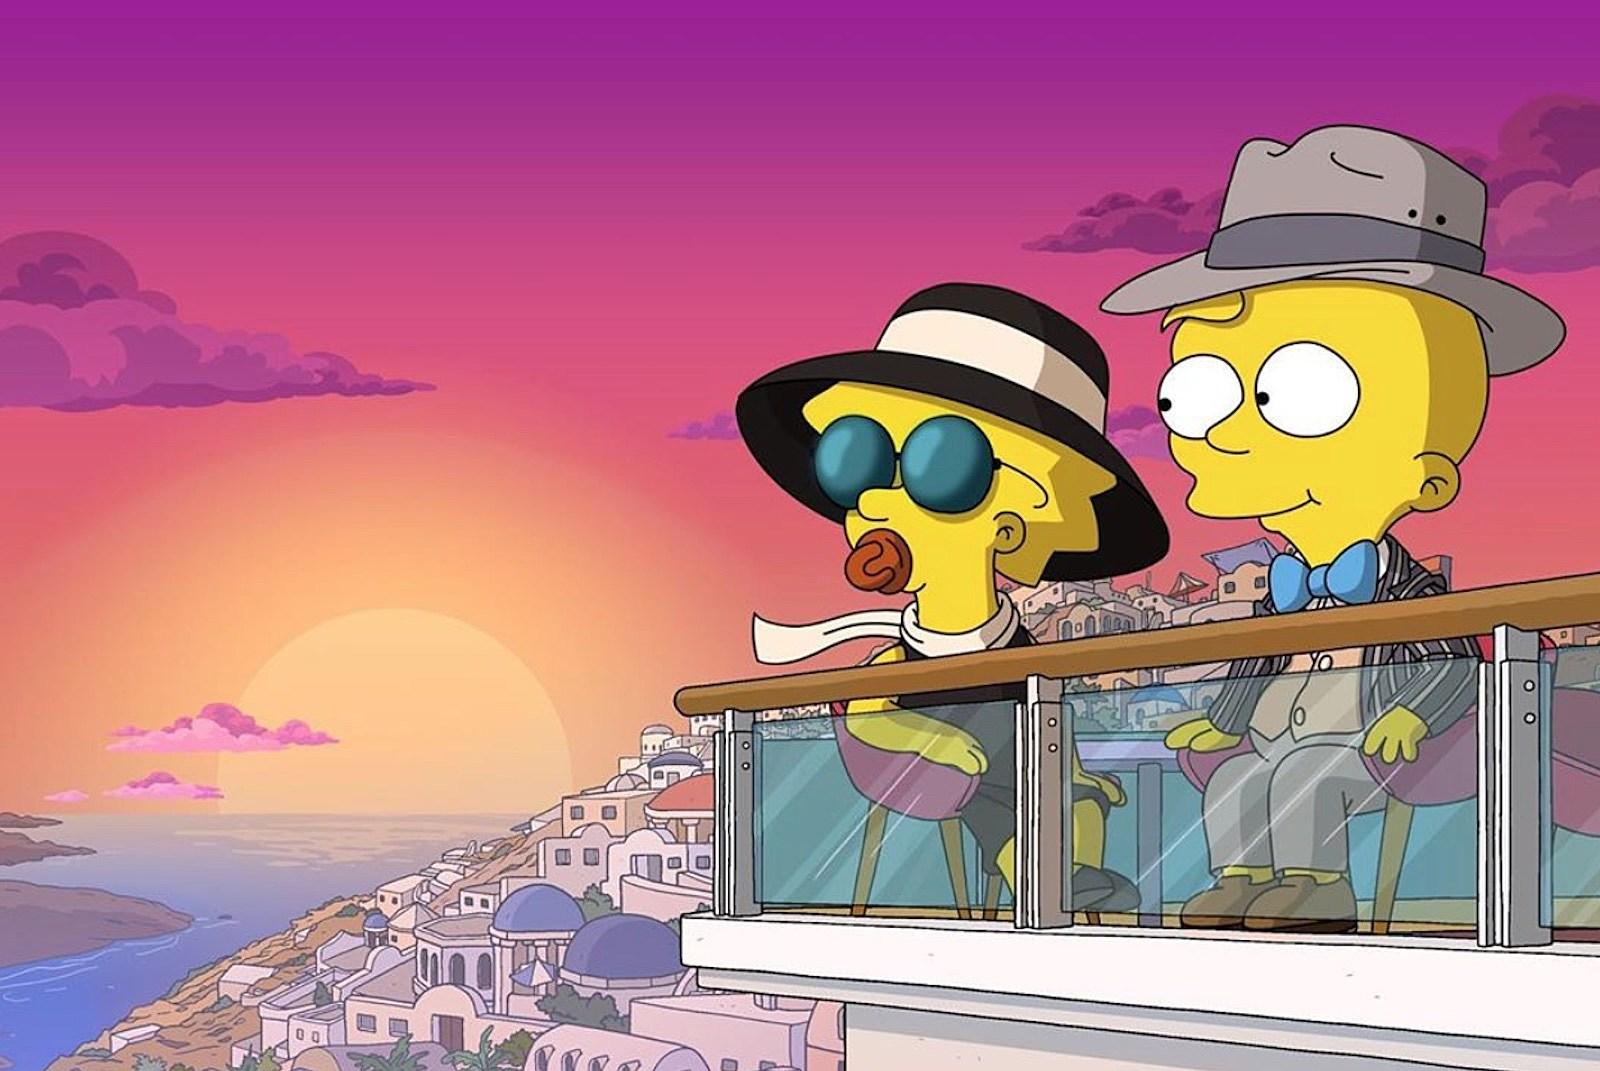 The Simpsons short onward